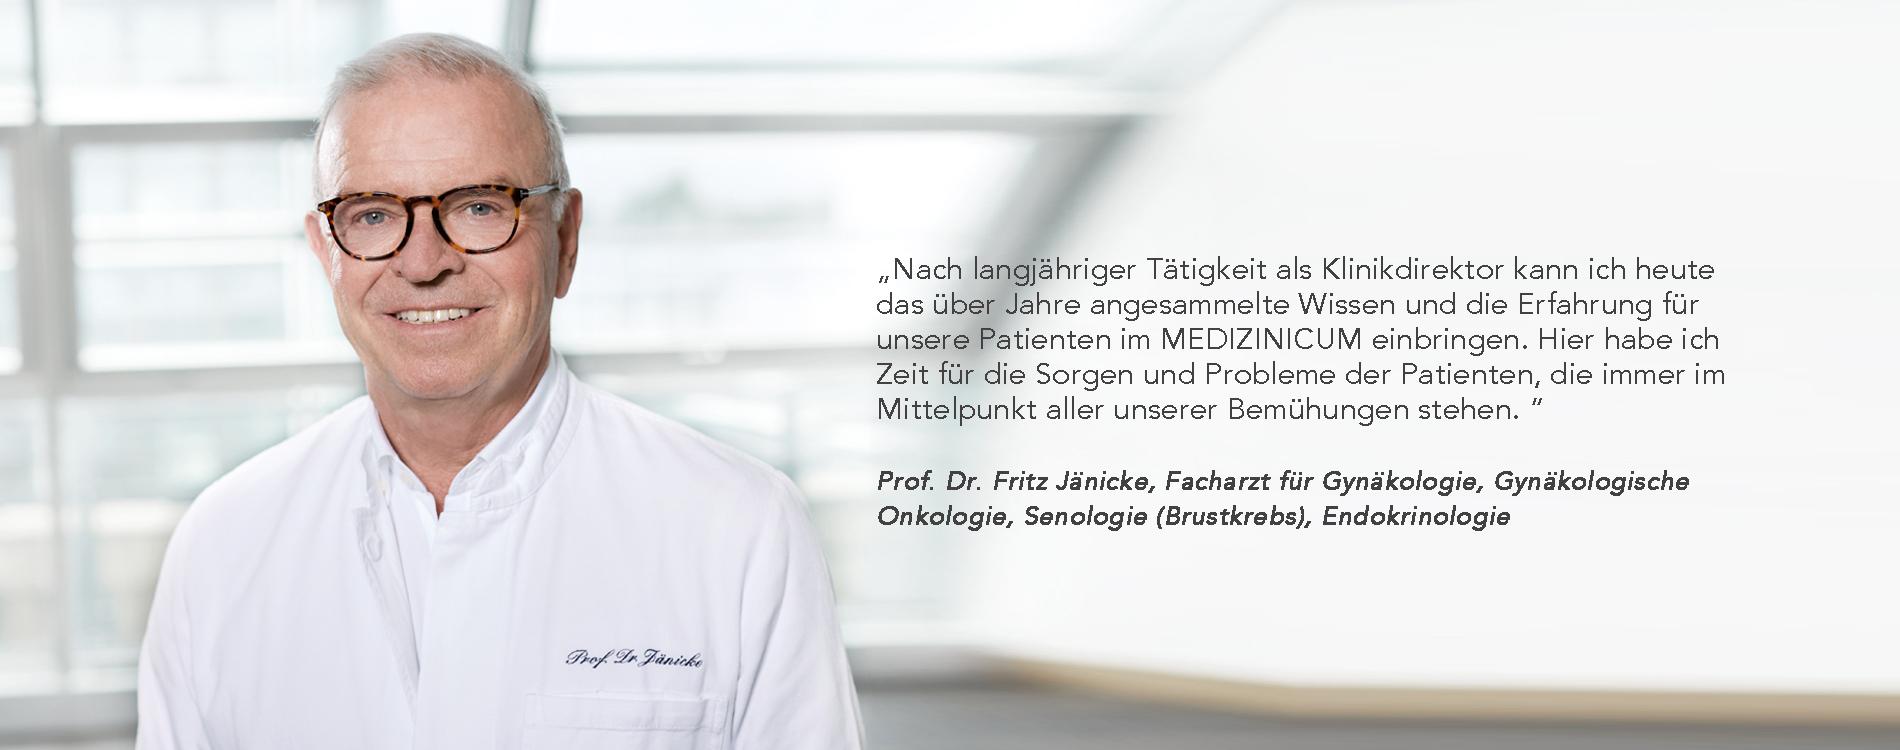 Stellenangebot-22-Text-MEDIZINICUM-Hamburg